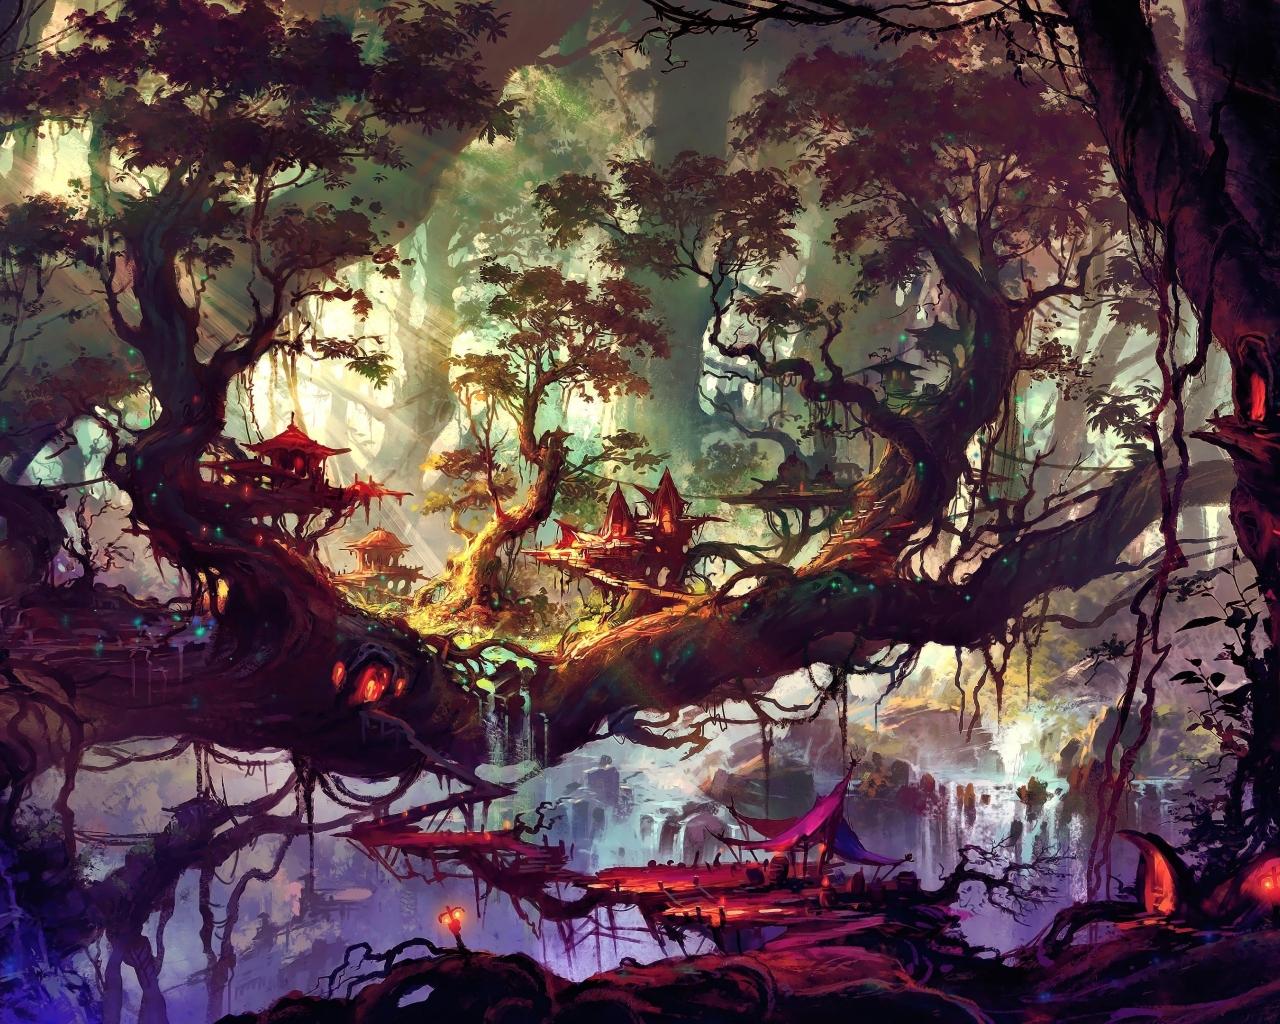 Elven Forest Wallpaper in 1280x1024 Resolution